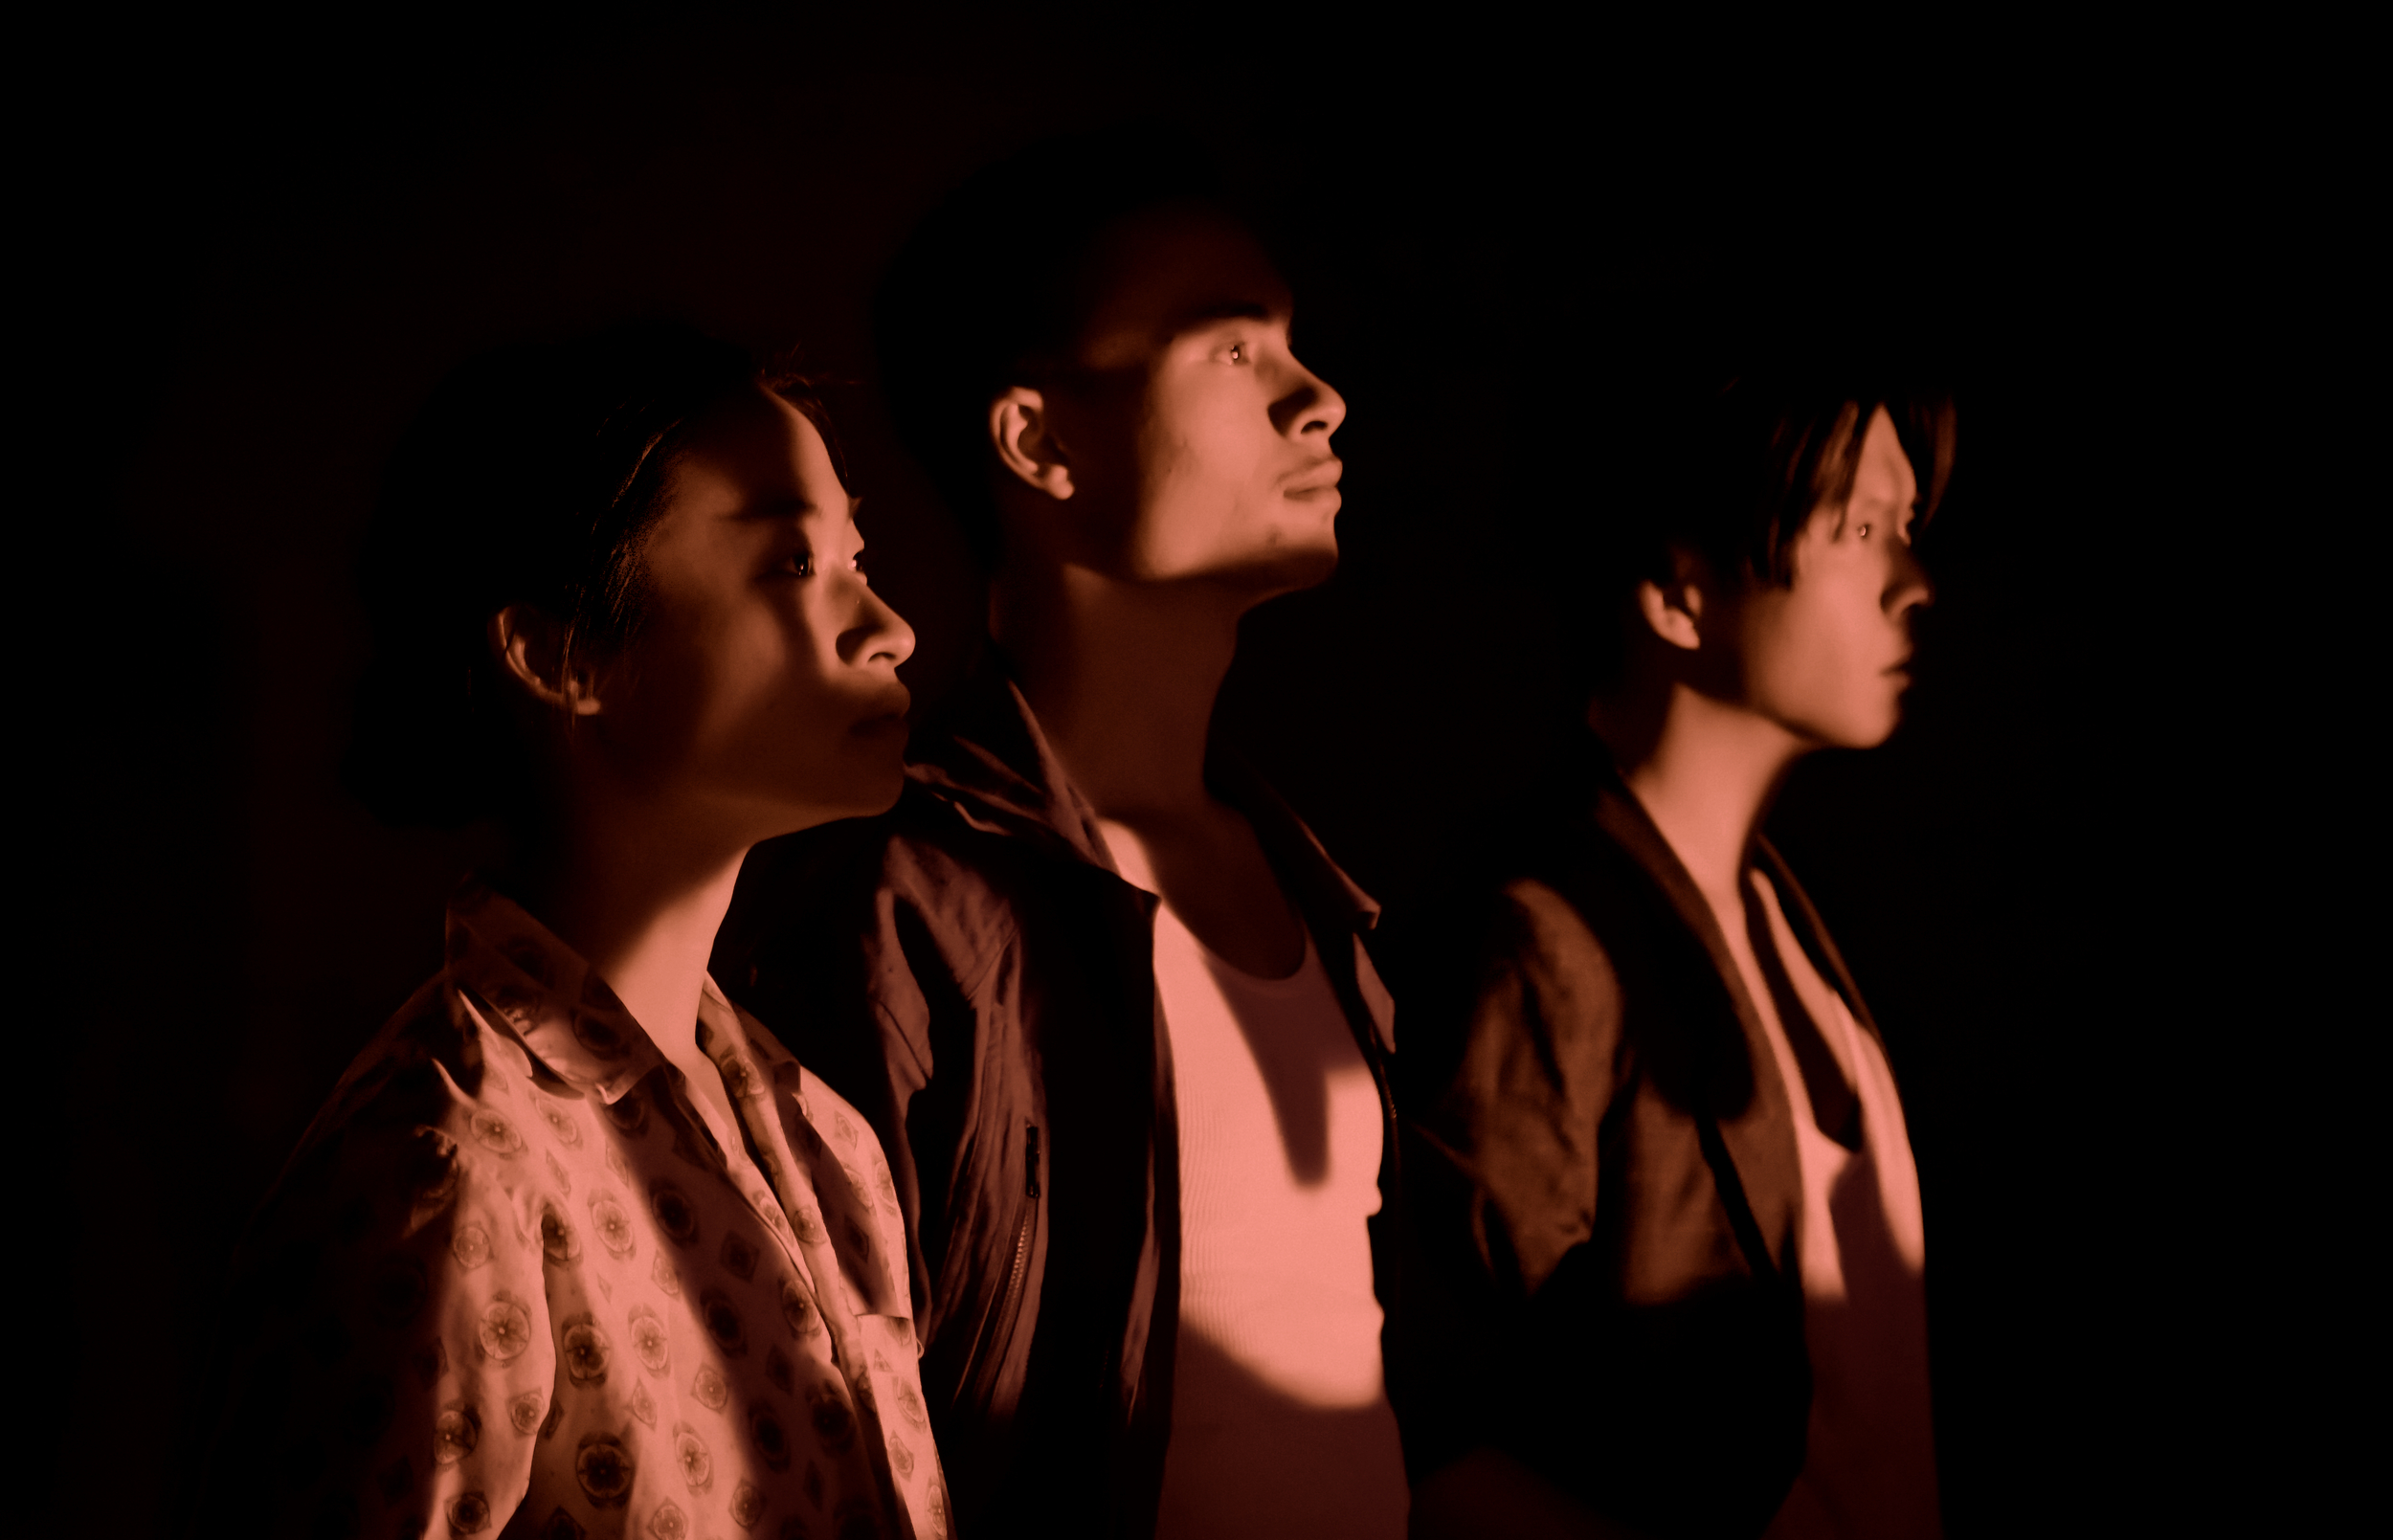 HKX - NINEEIGHT Promotional Photo 2.jpg